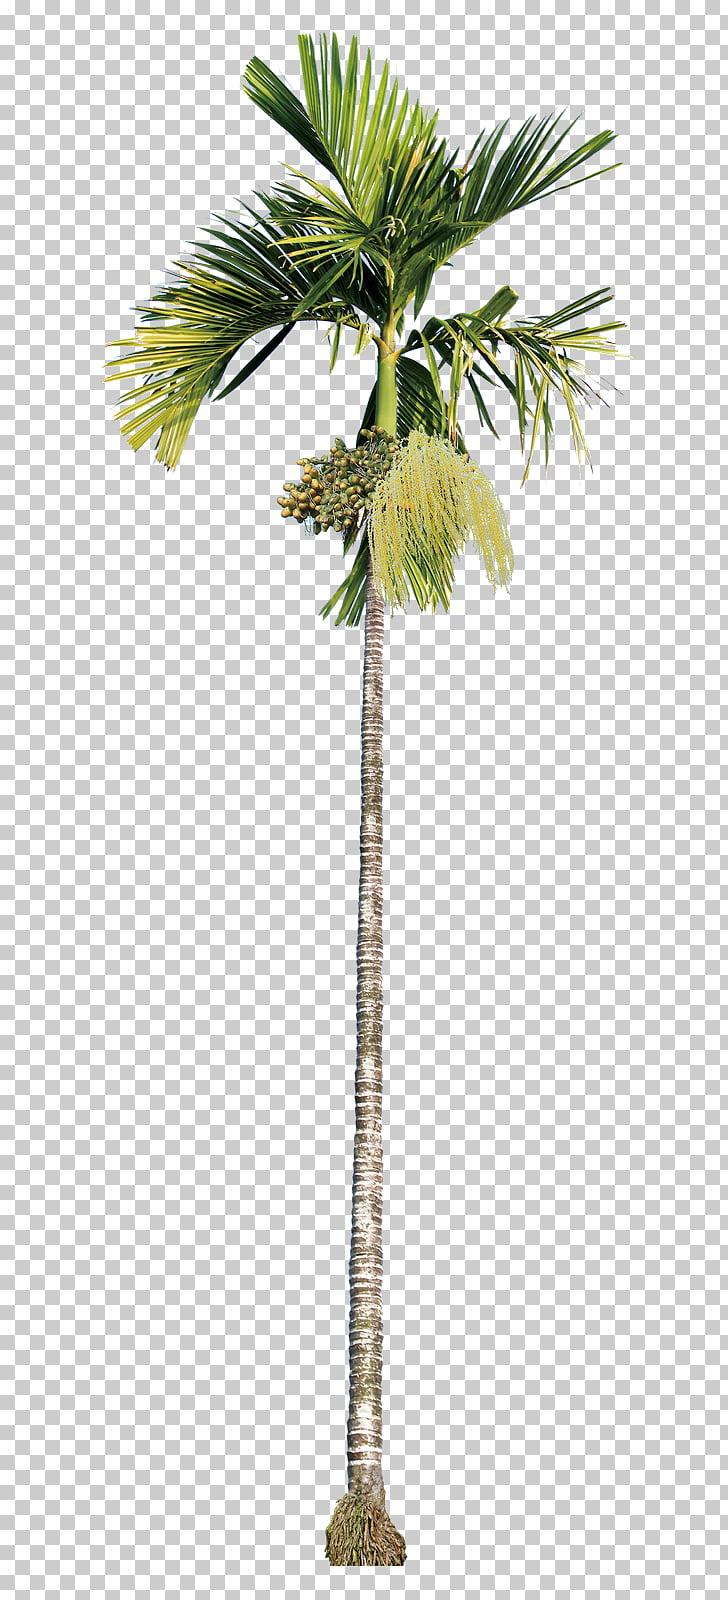 Areca palm Asian palmyra palm Areca nut Betel nut beauty.